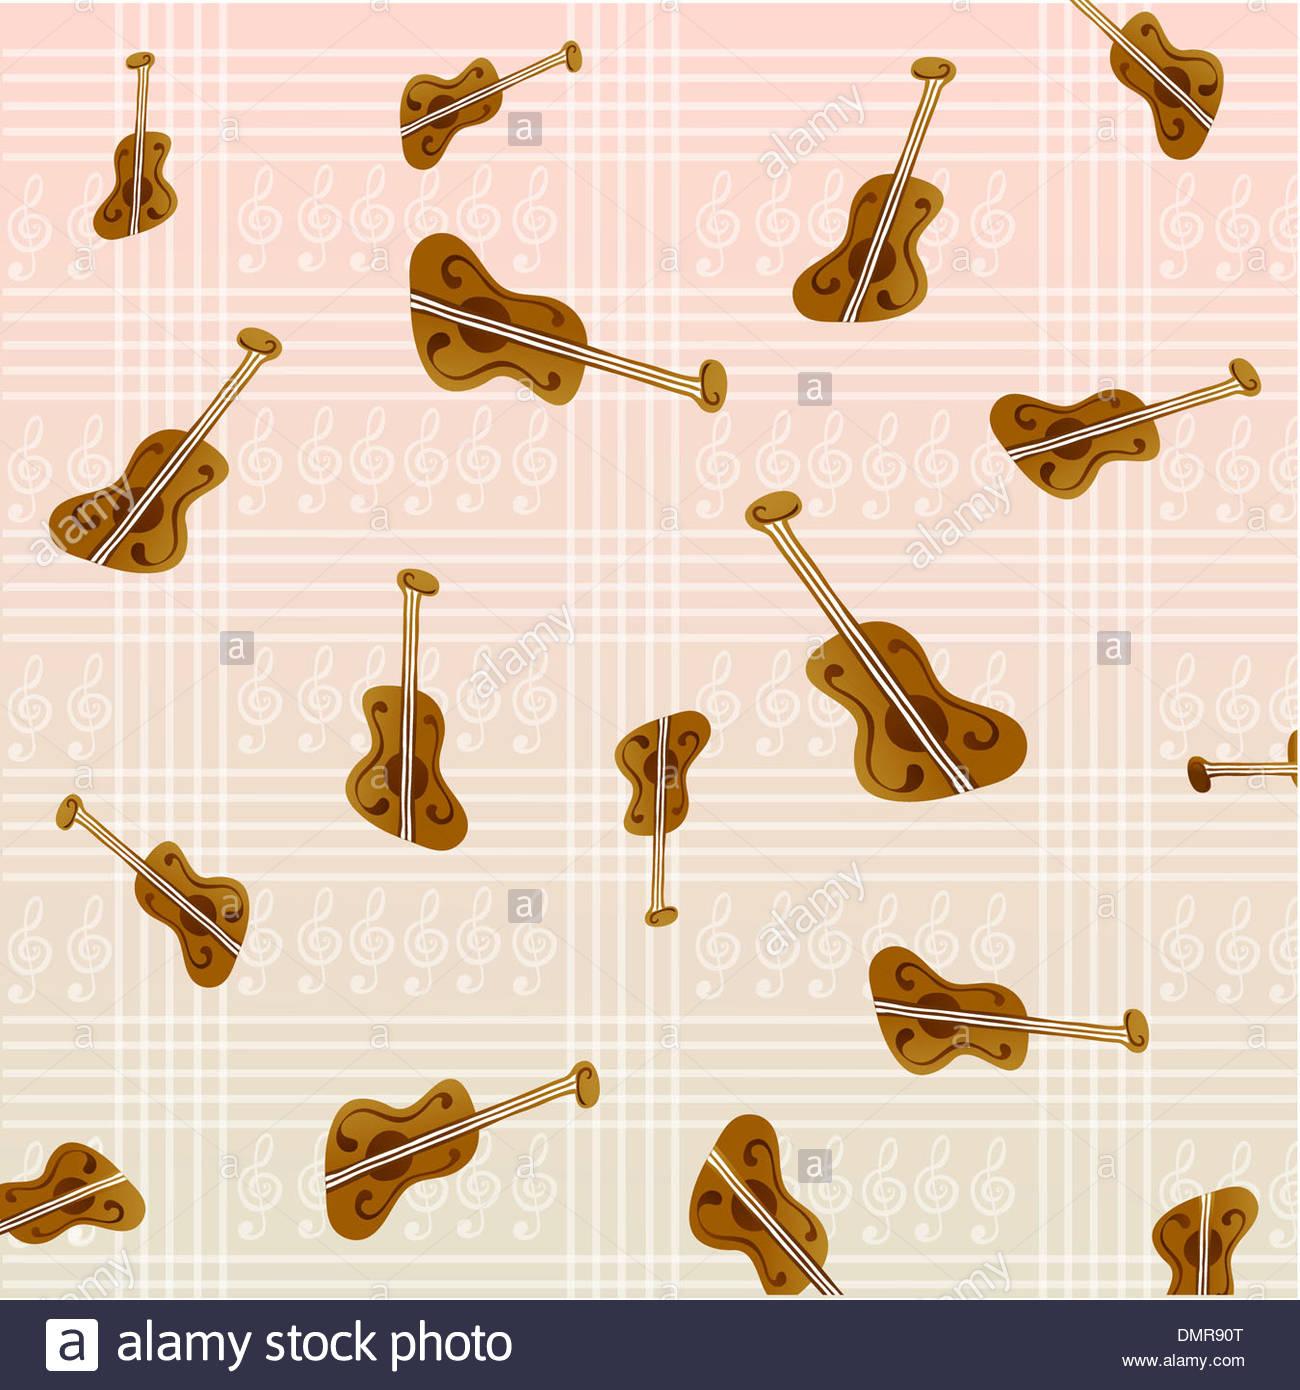 Violin Wallpaper: Cello, Wallpaper, Violin, Music, Background, Indoors